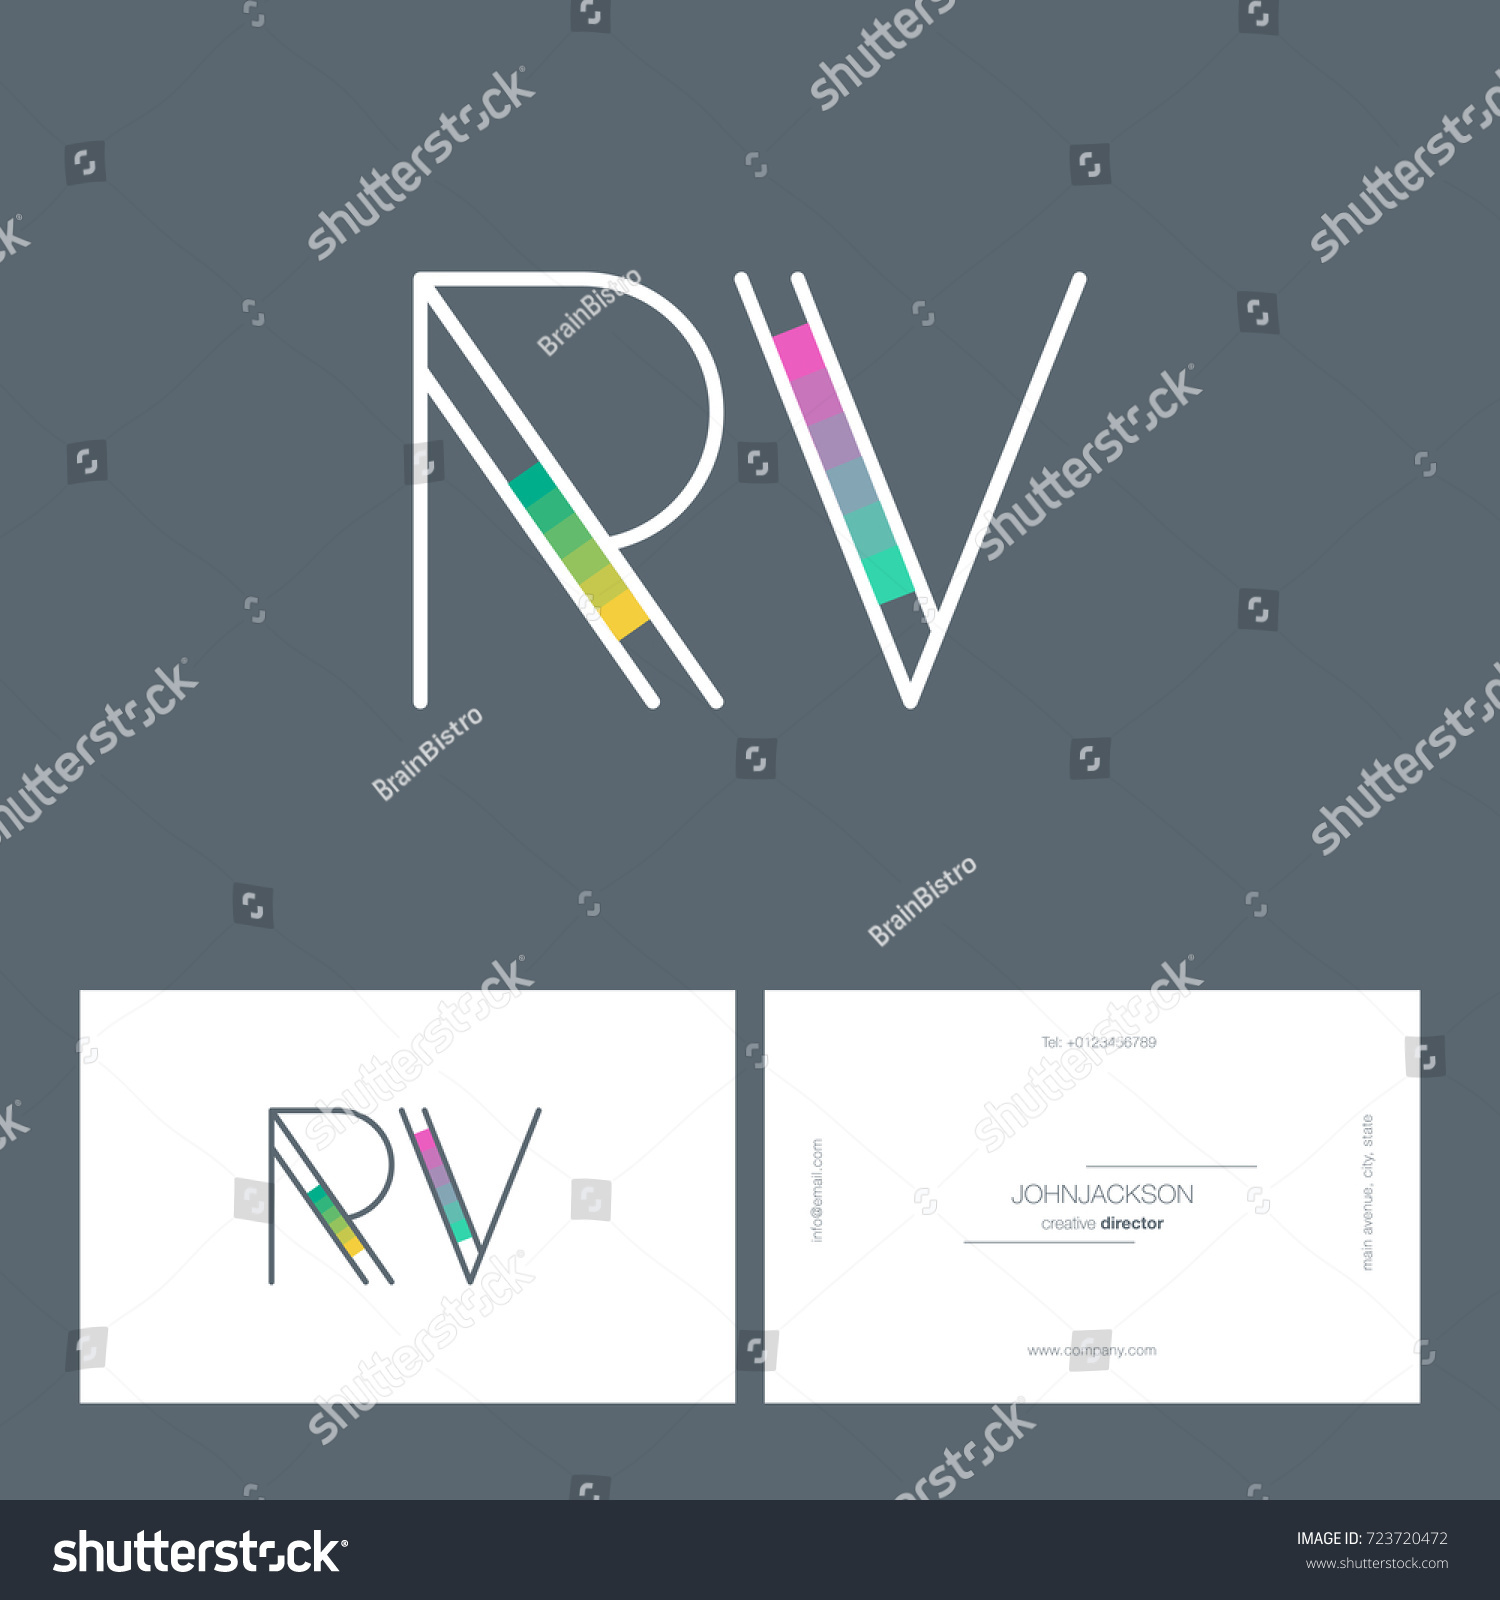 Letters r v logo business card stock vector 723720472 shutterstock letters r v logo with business card template vector colourmoves